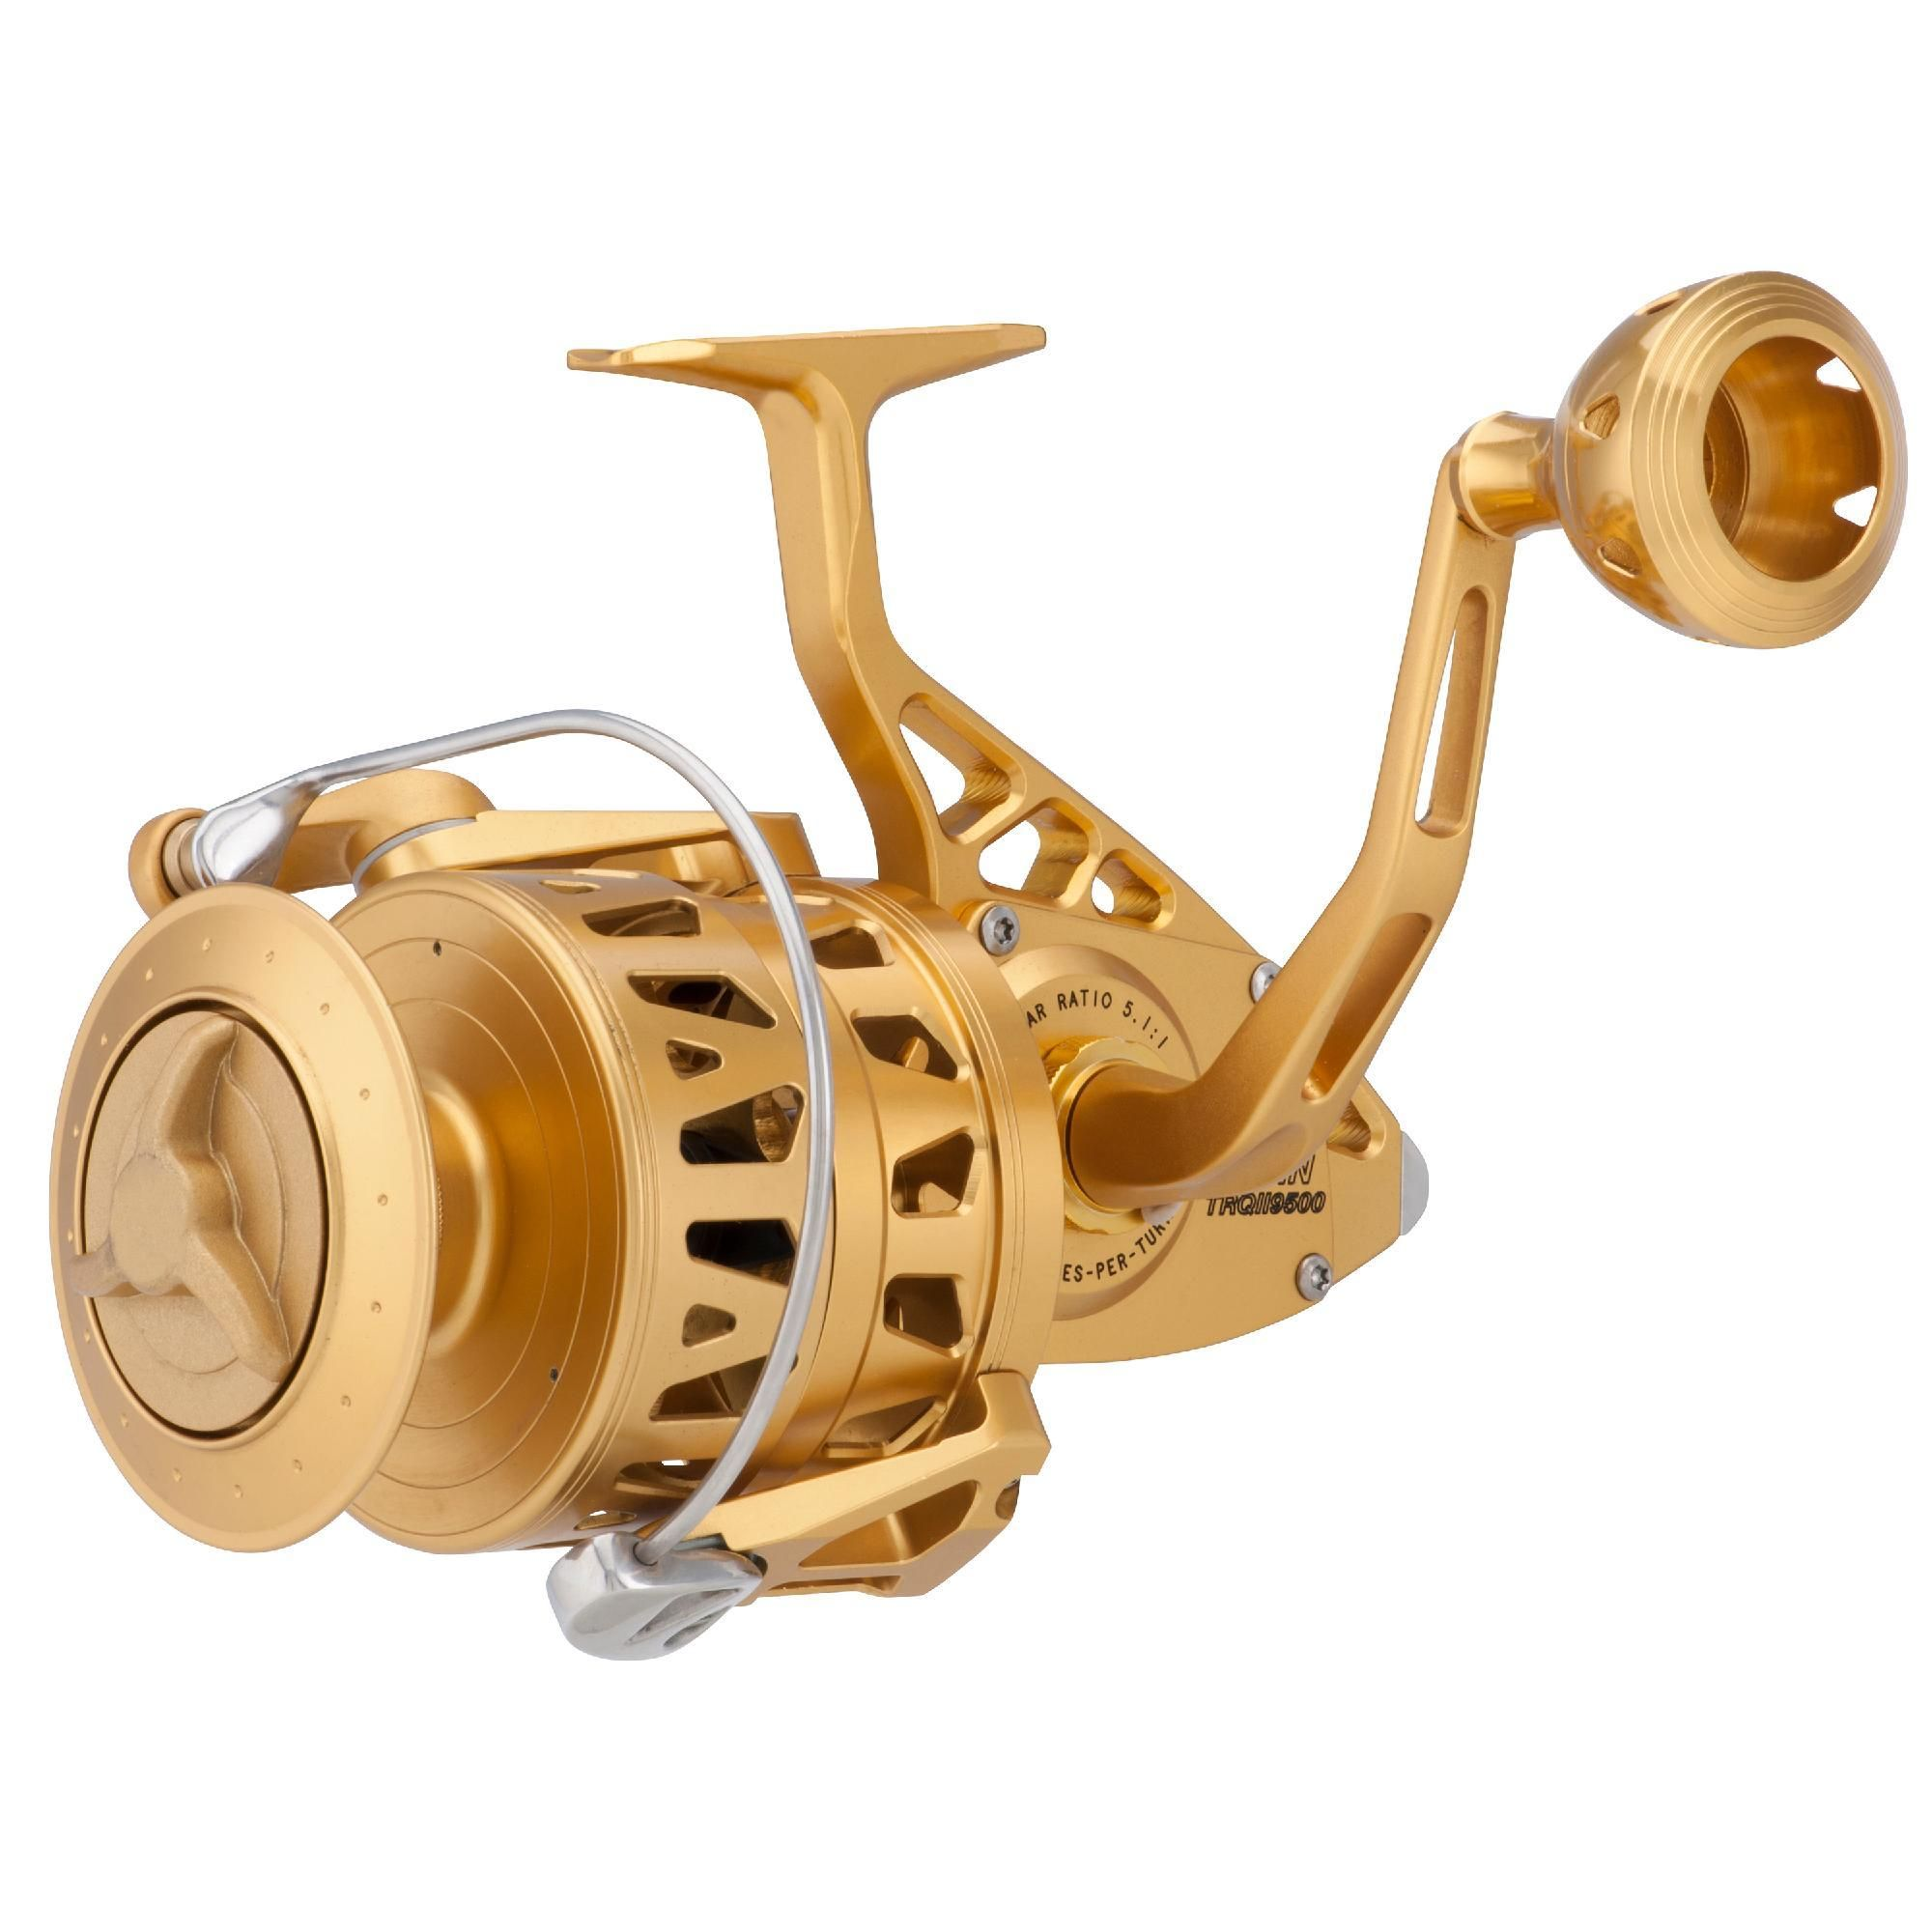 Torque II Spinning Reel - 9500, 5 1:1 Gear Ratio, 50